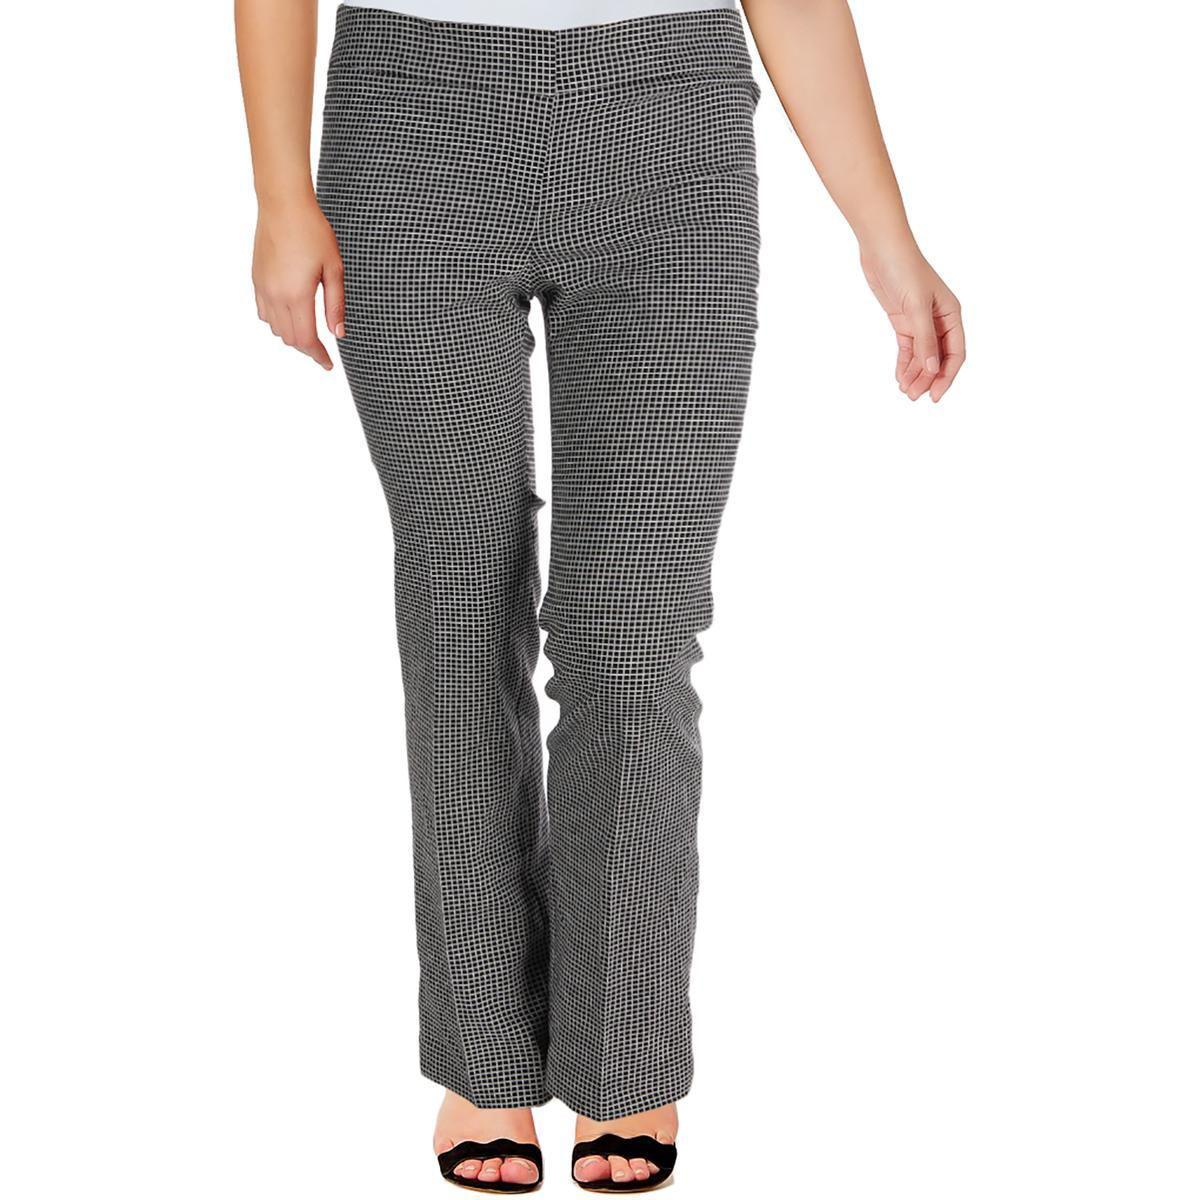 Lyst - Nine West Womens The Trouser Checked No Pockets Dress Pants ... 46b8367ec4